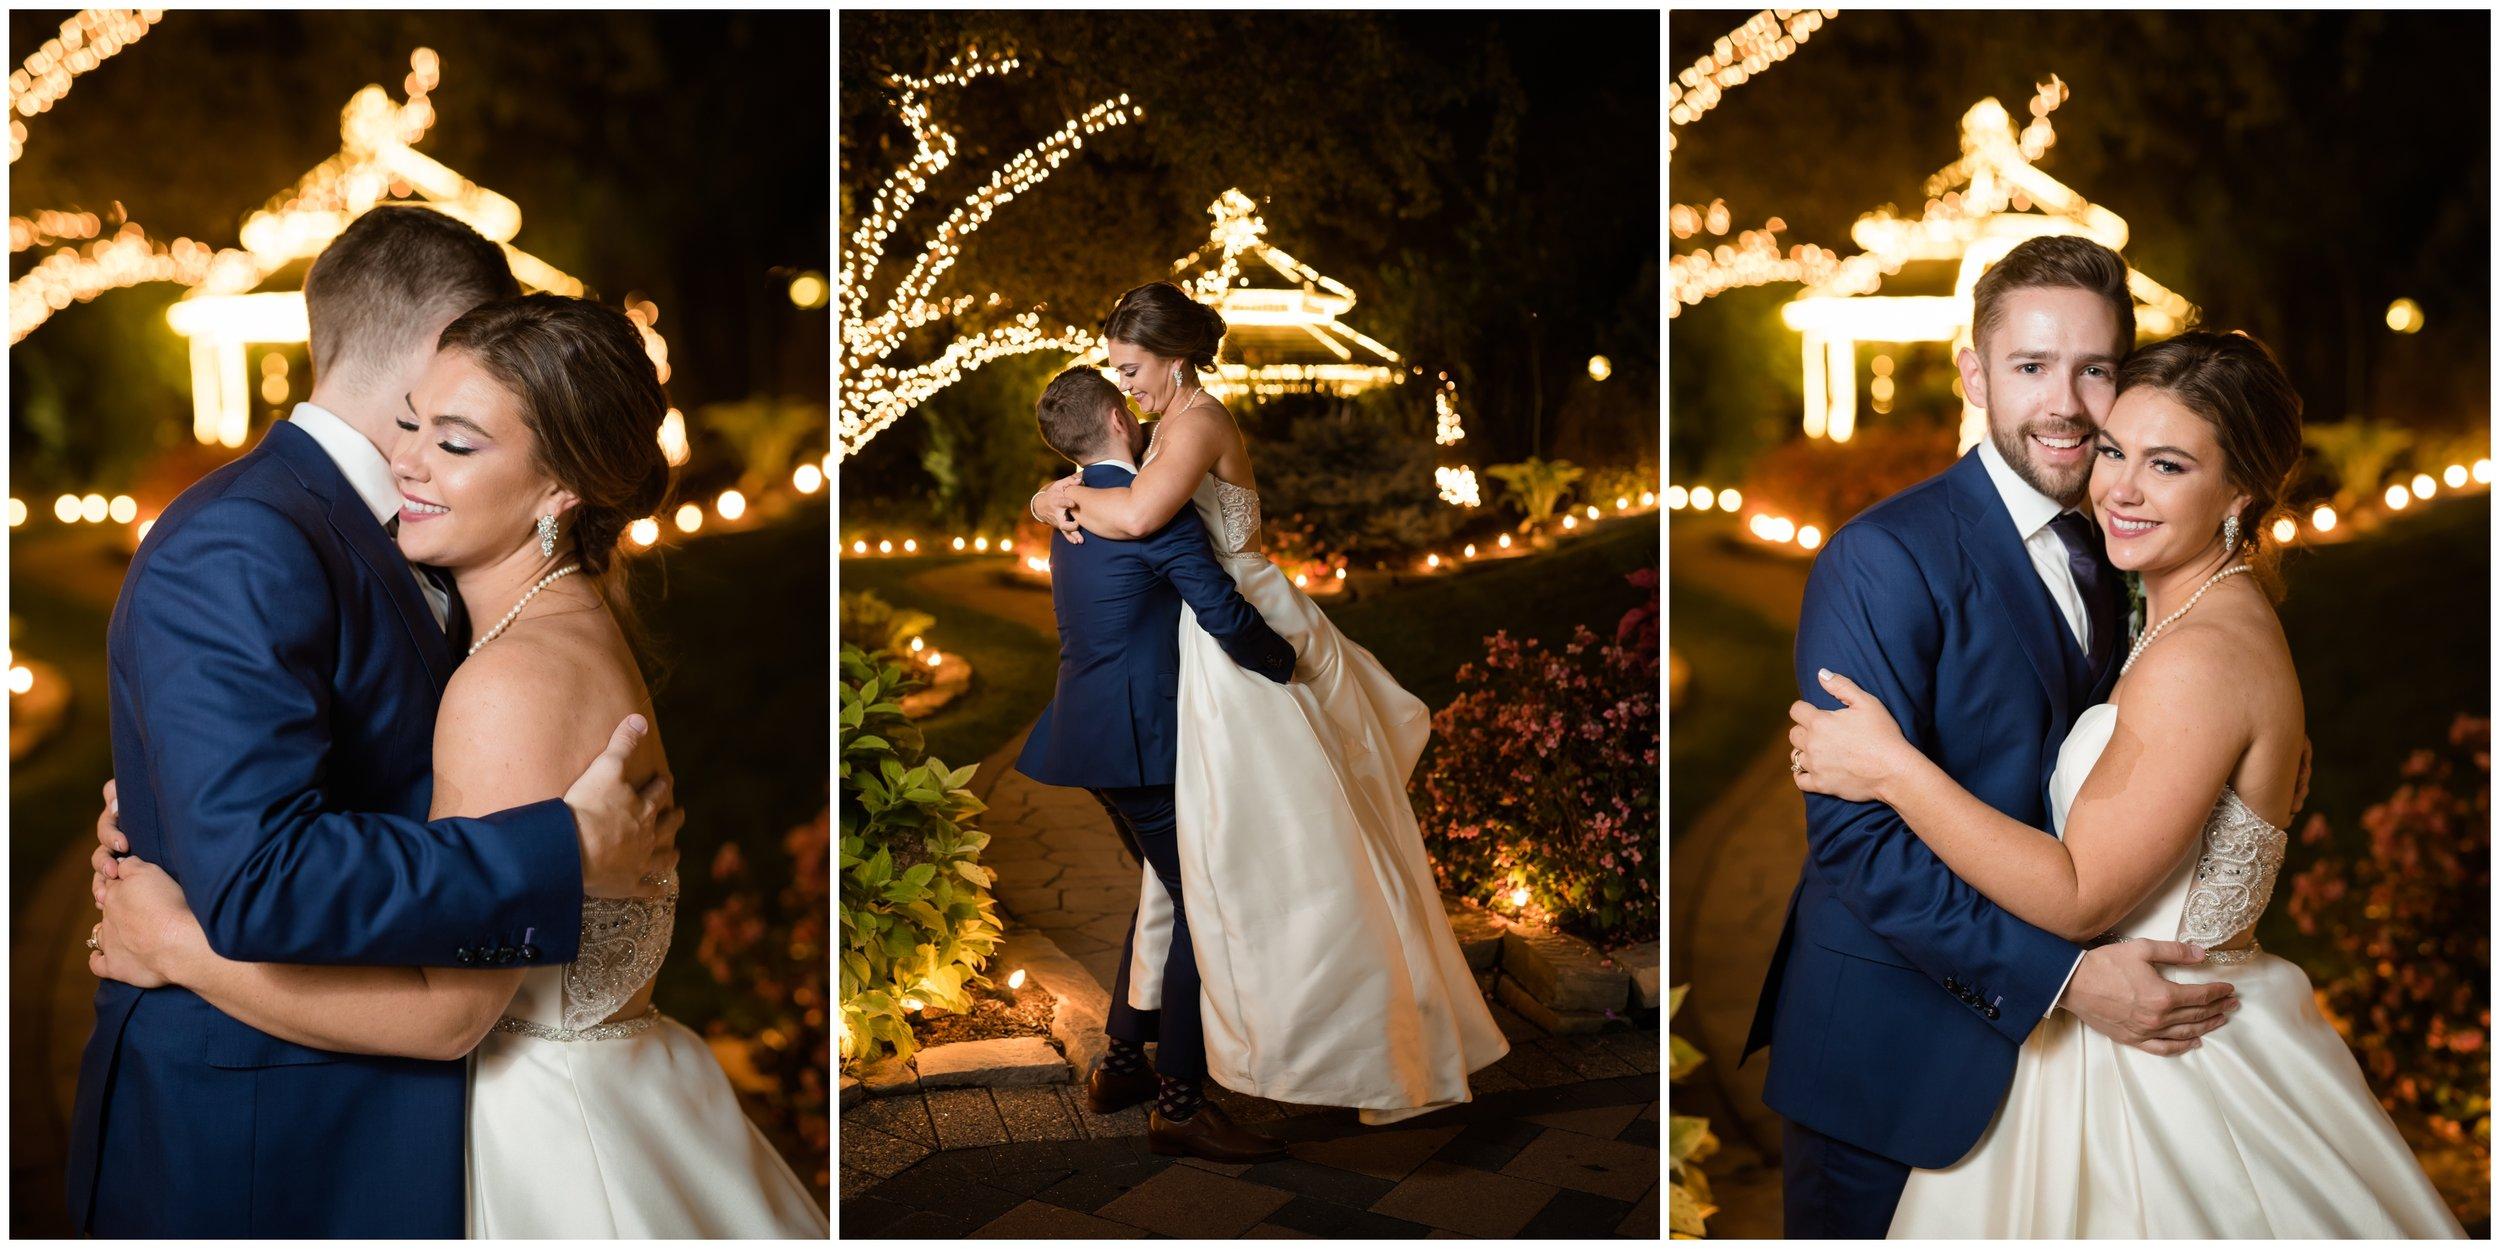 Silver Lake Country Club Wedding Photo Idea